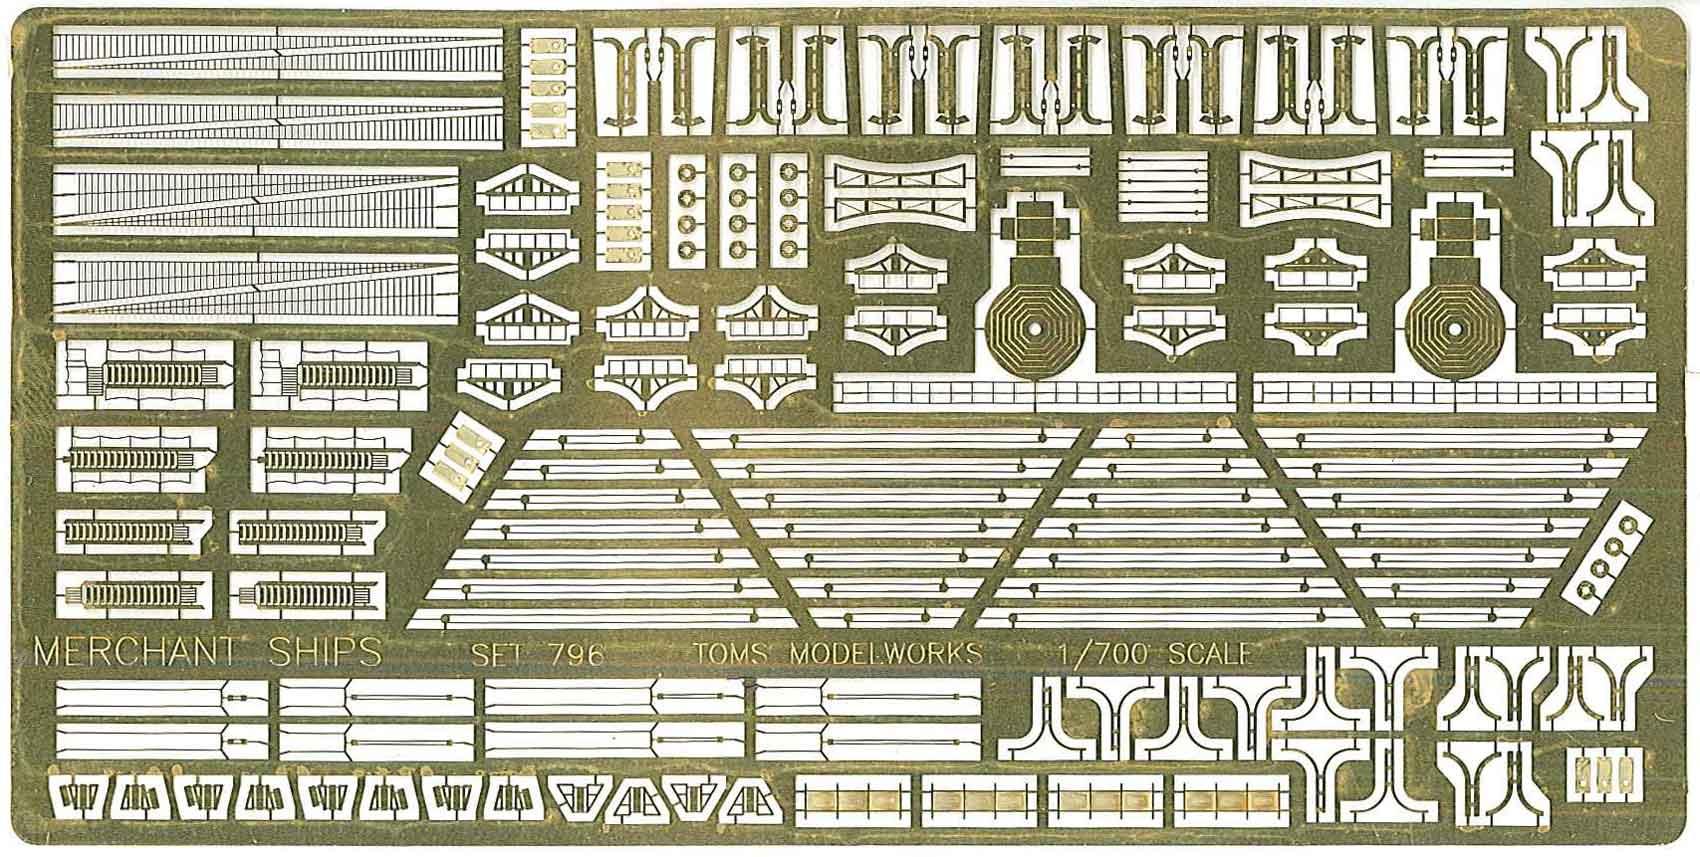 PE333 1/700 日本商船用 エッチングパーツ